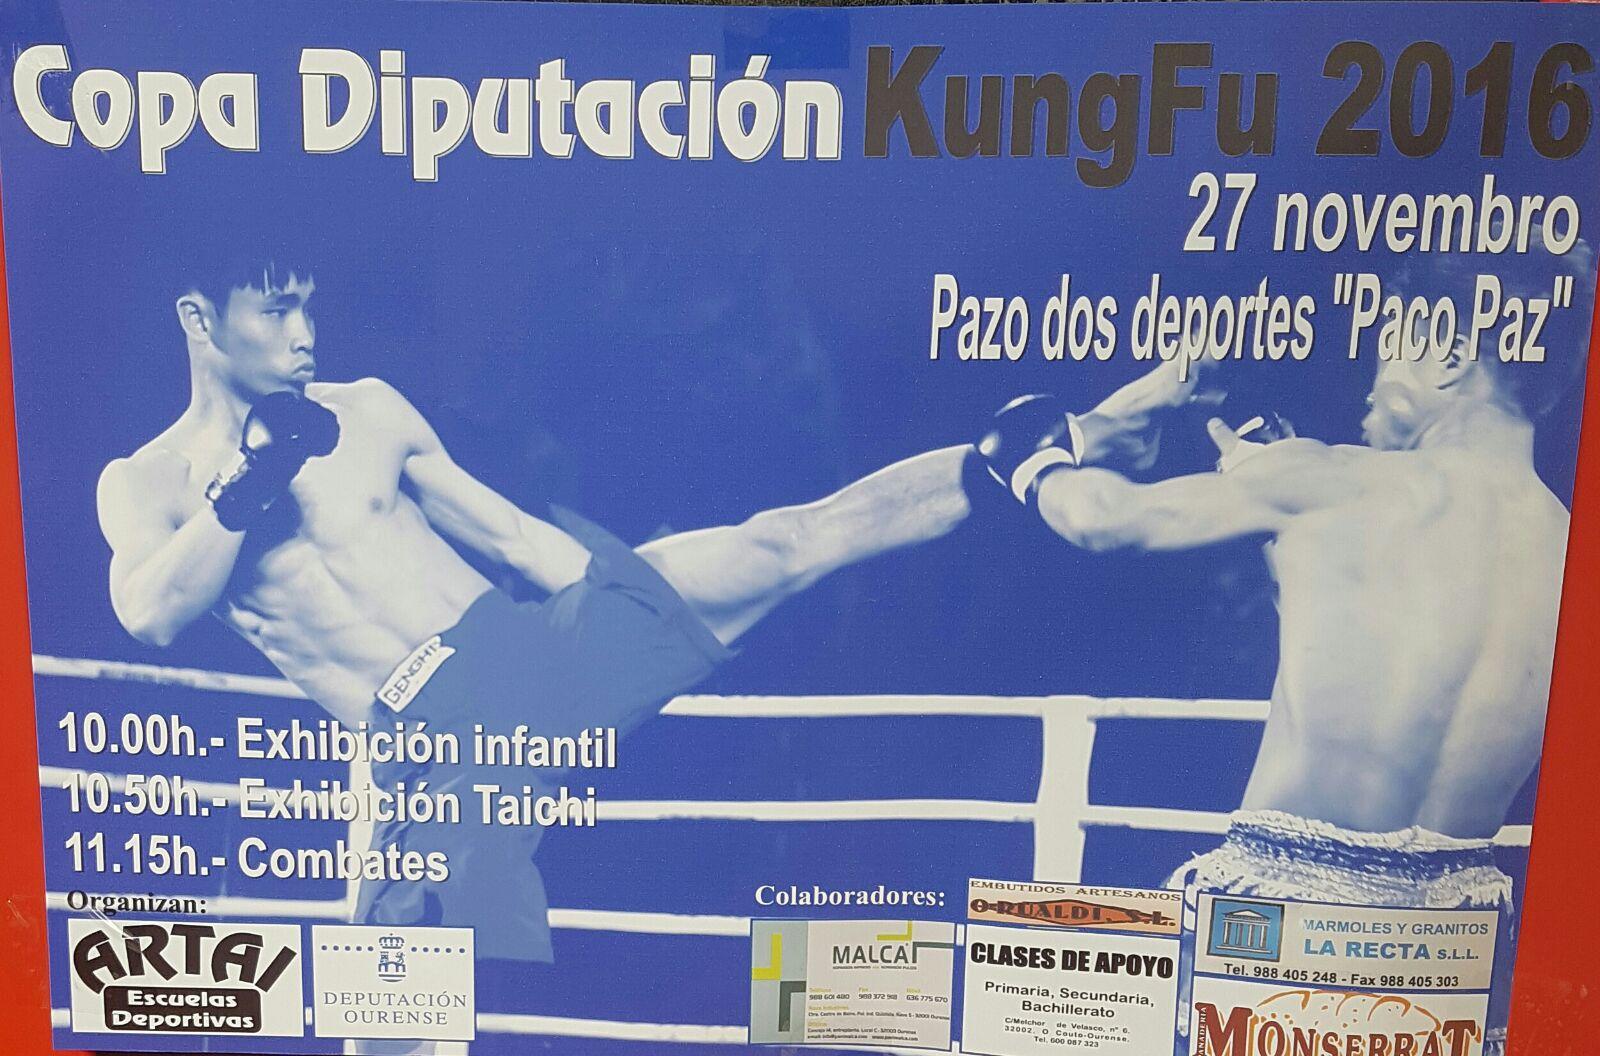 Copa Diputación de Kungfu